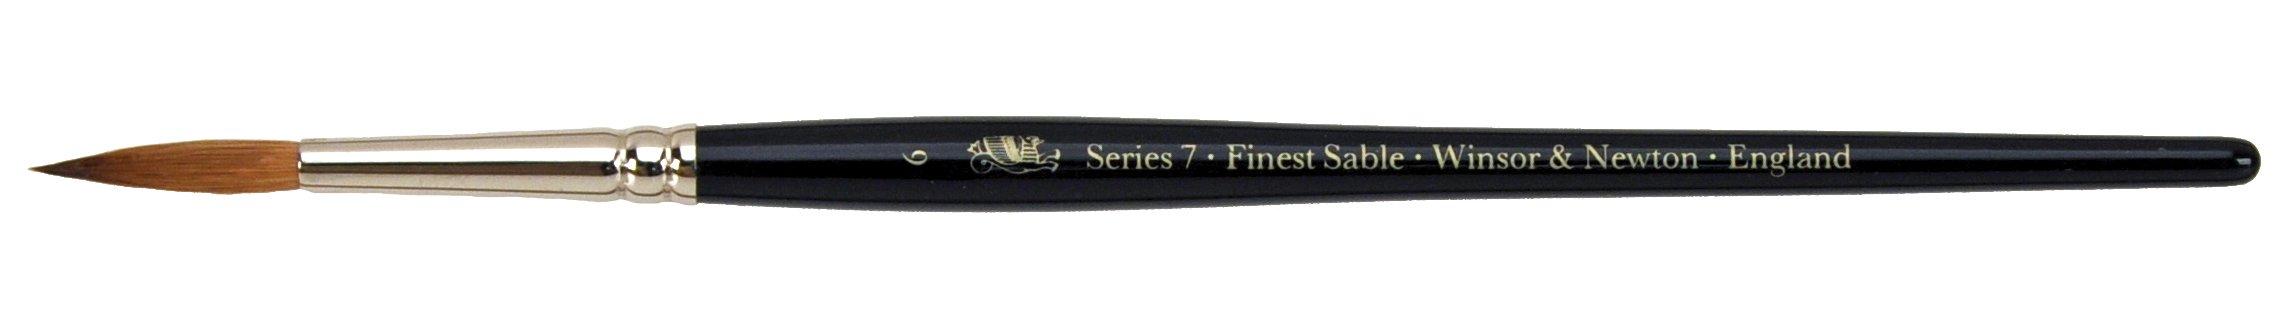 Winsor & Newton Series 7 Kolinsky Sable Watercolor Brush - Round #6